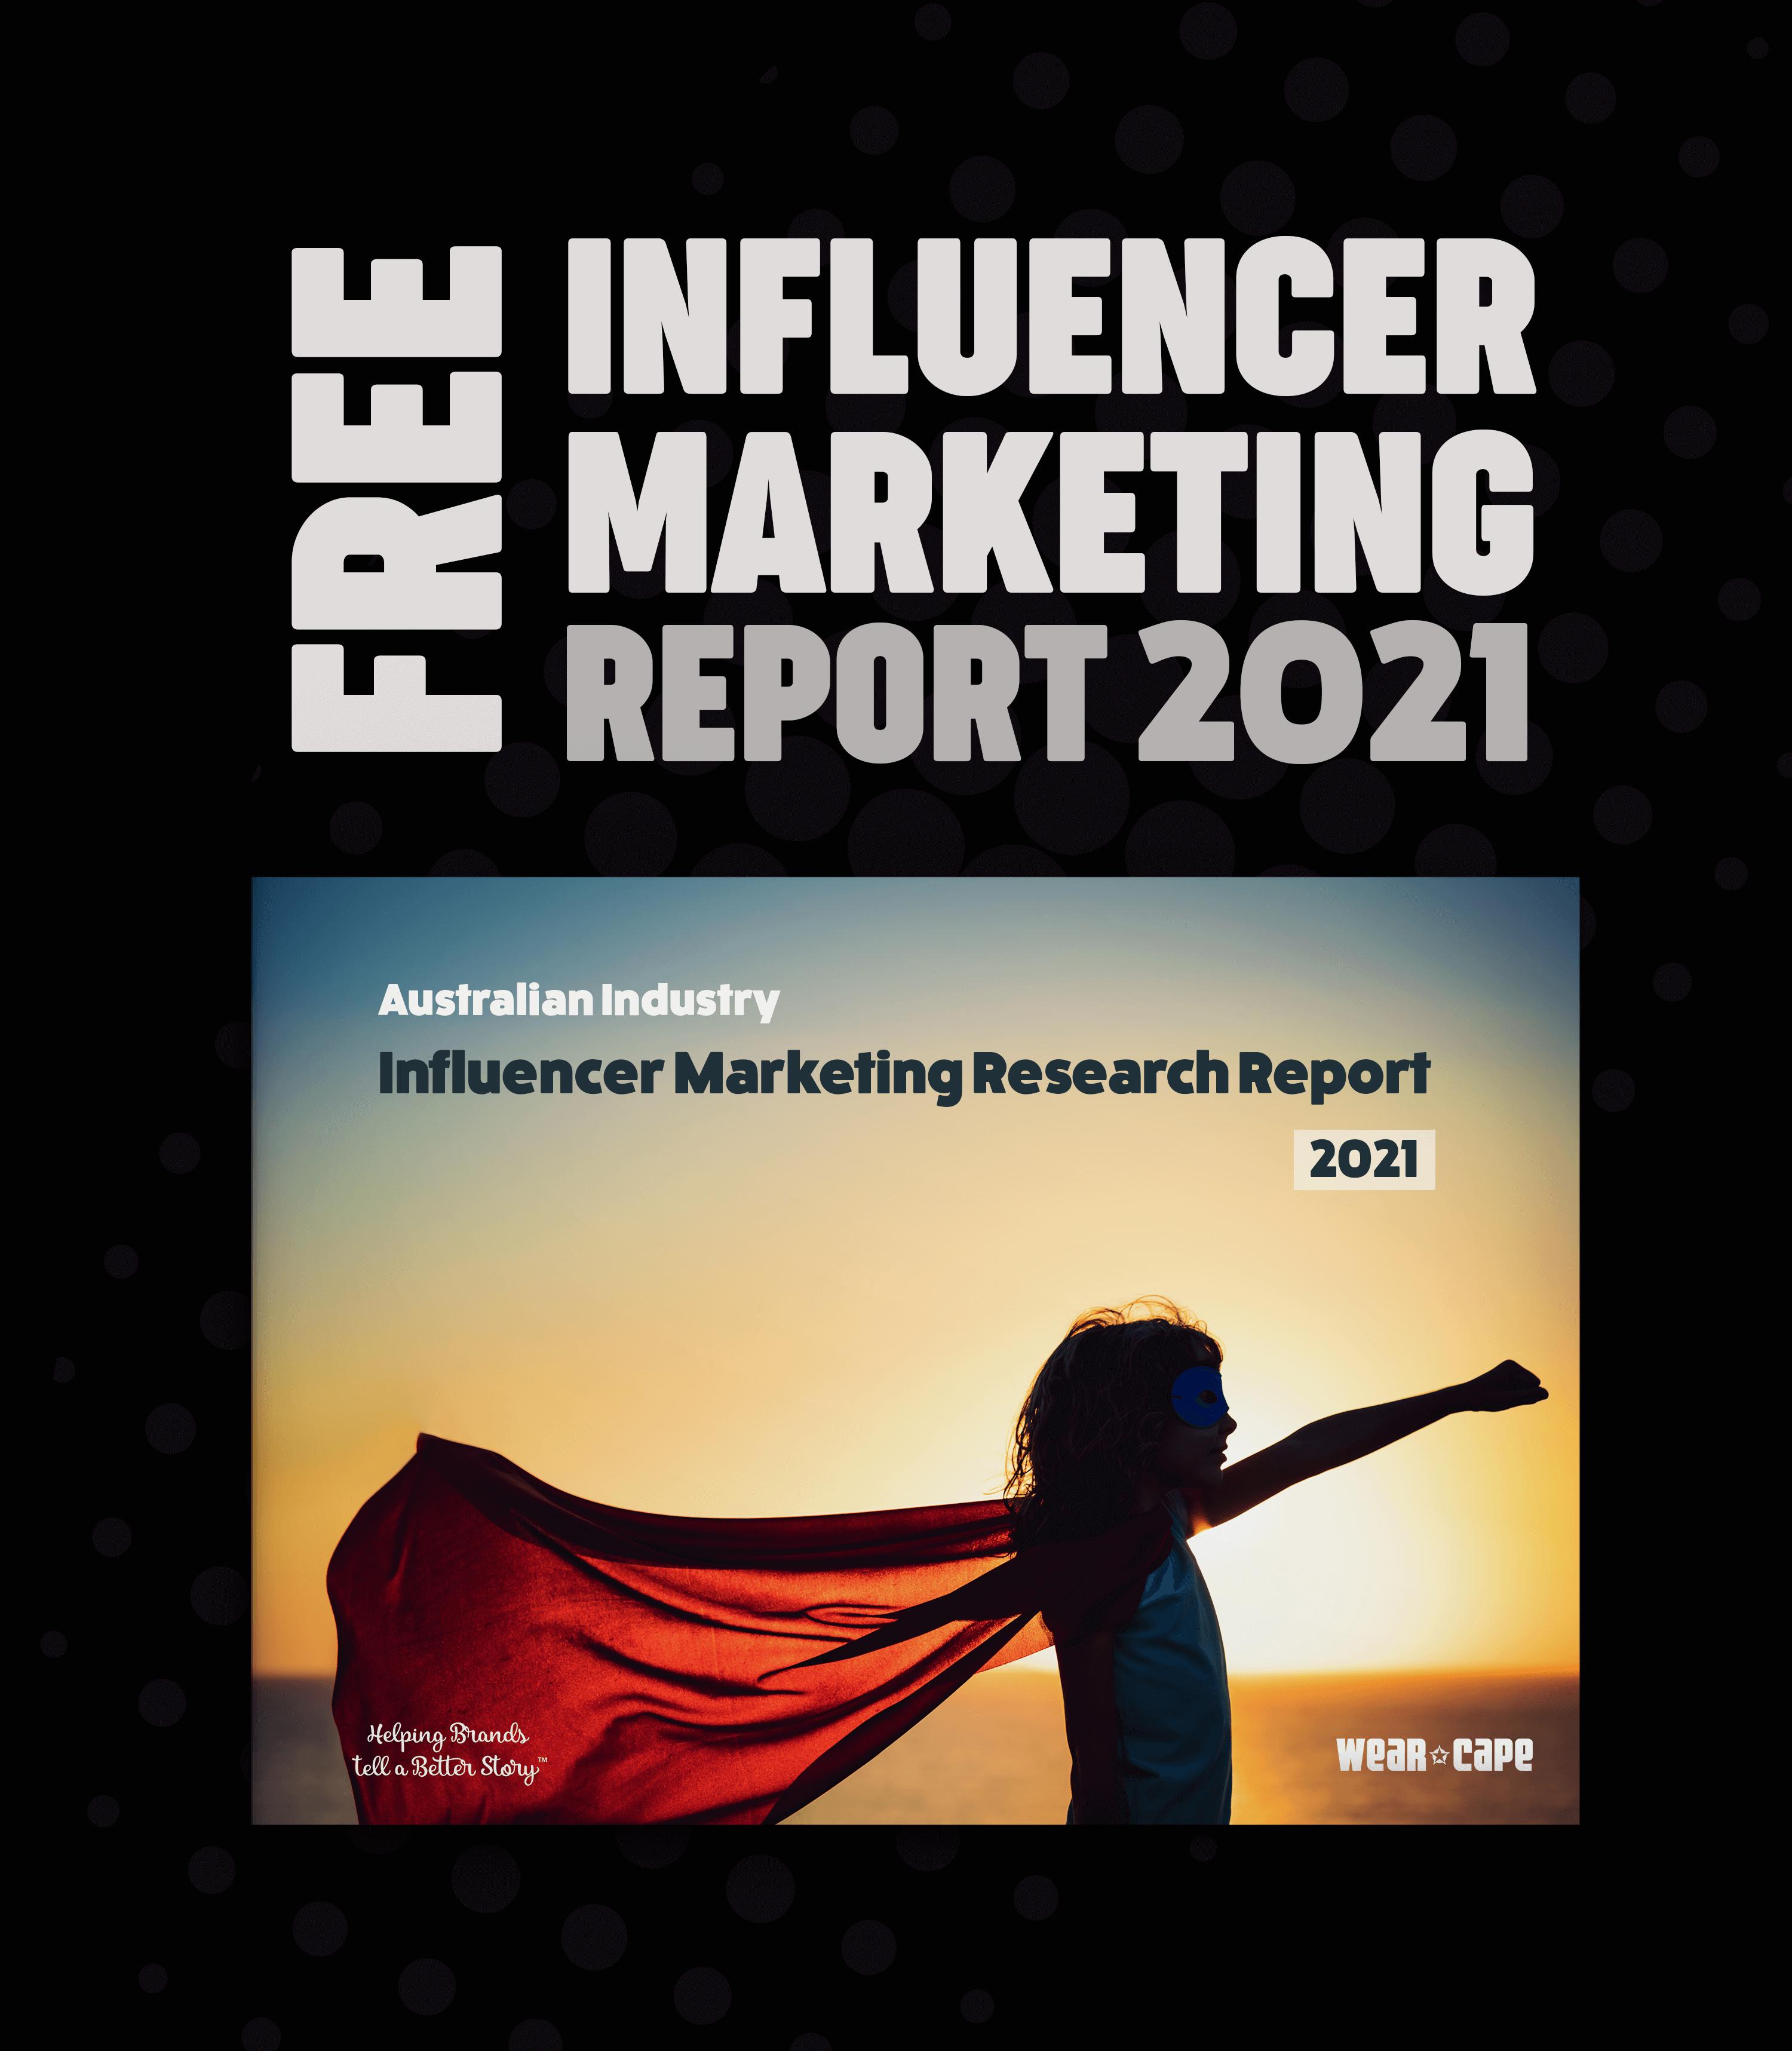 The Australian Influencer Marketing Industry Report 2021